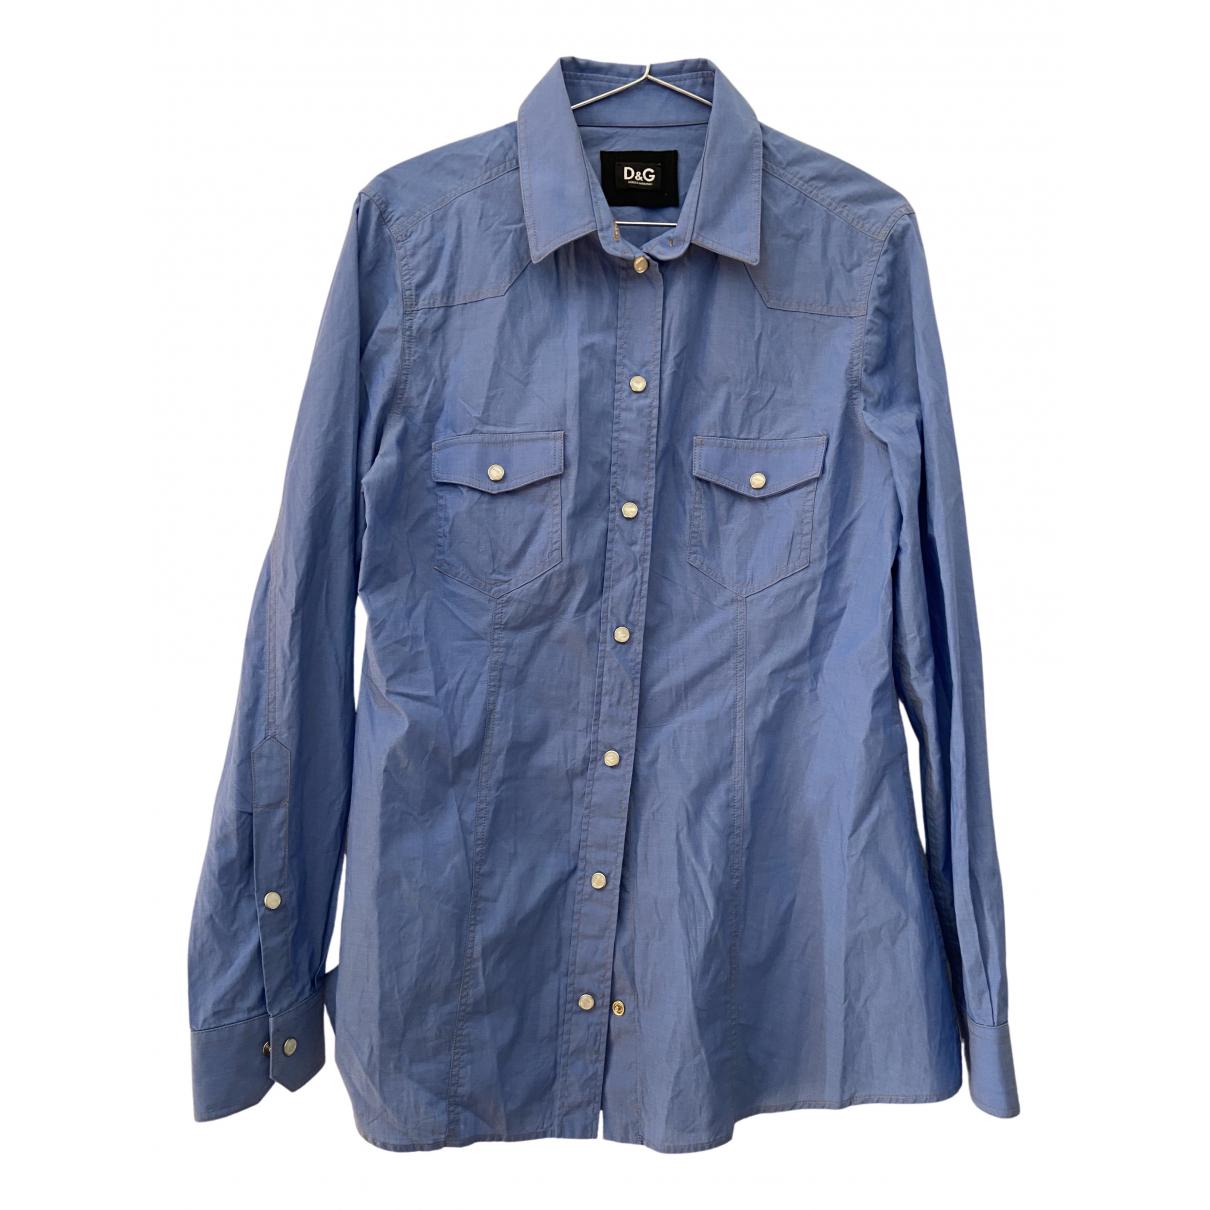 D&g N Turquoise Cotton Shirts for Men M International